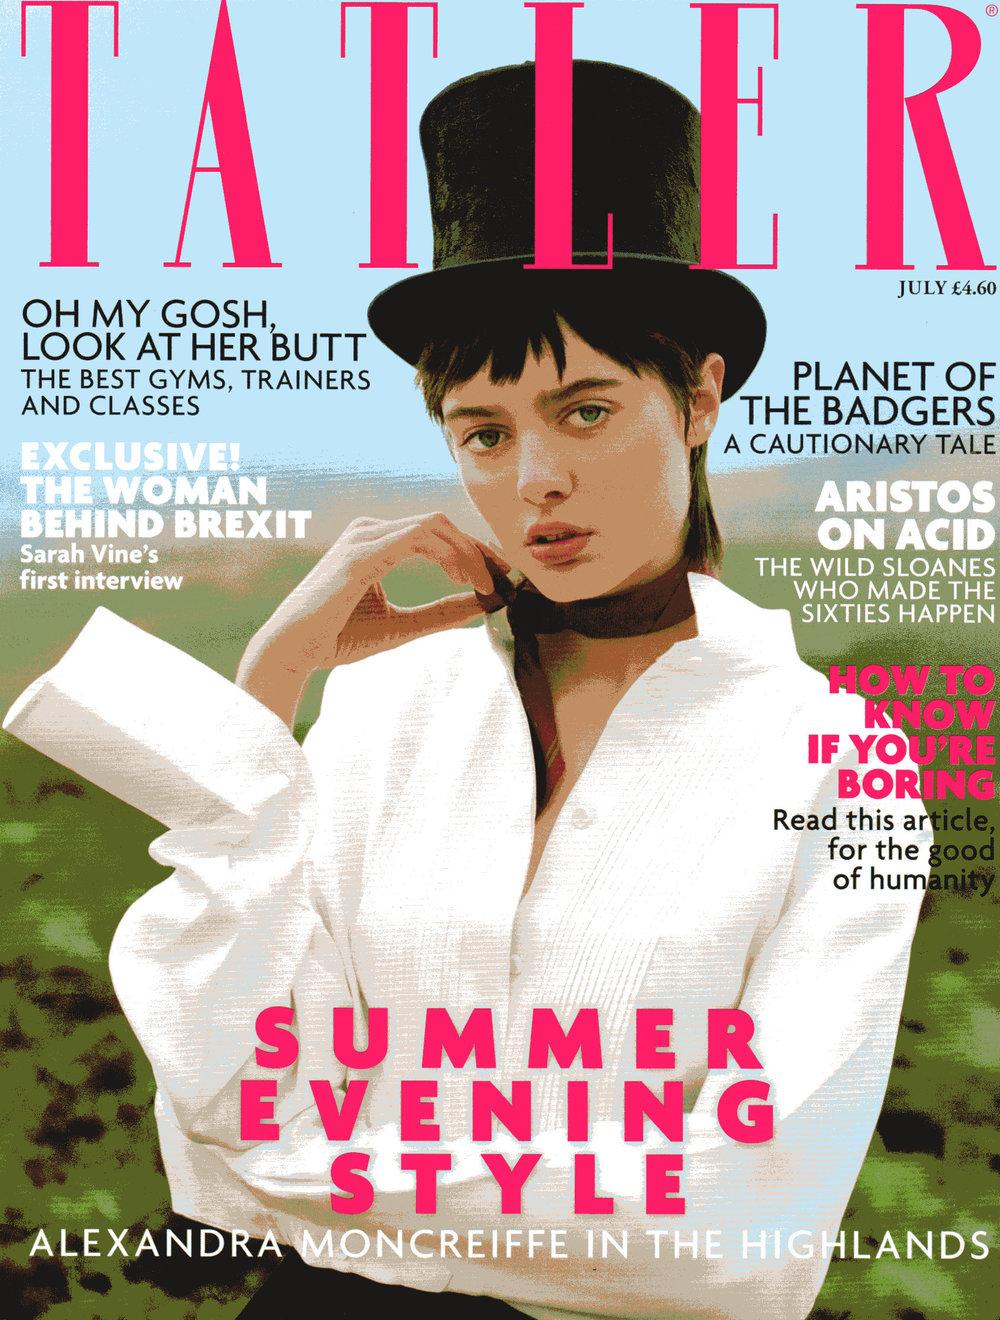 Tatler July 2017 Front Page.jpg